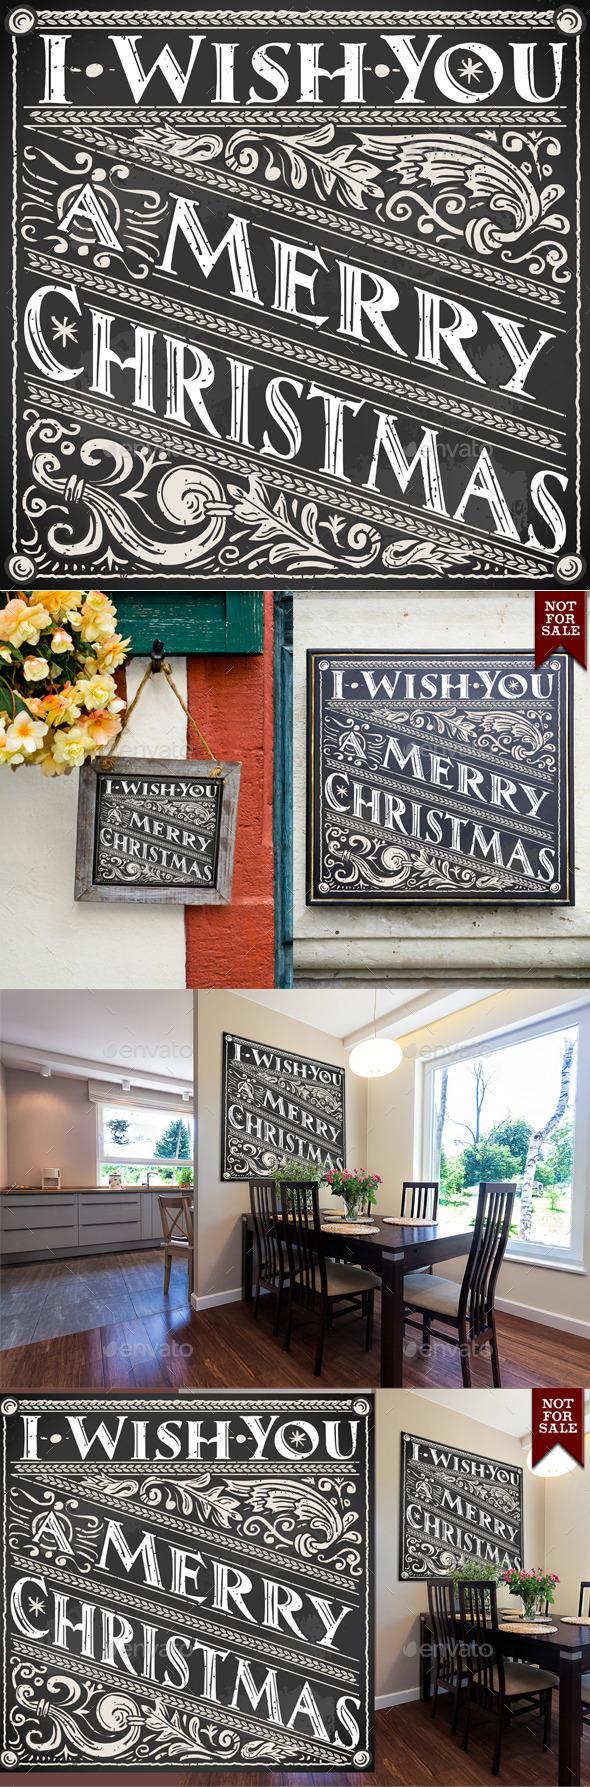 Vintage Greeting Card Text on a Blackboard  - Christmas Seasons/Holidays